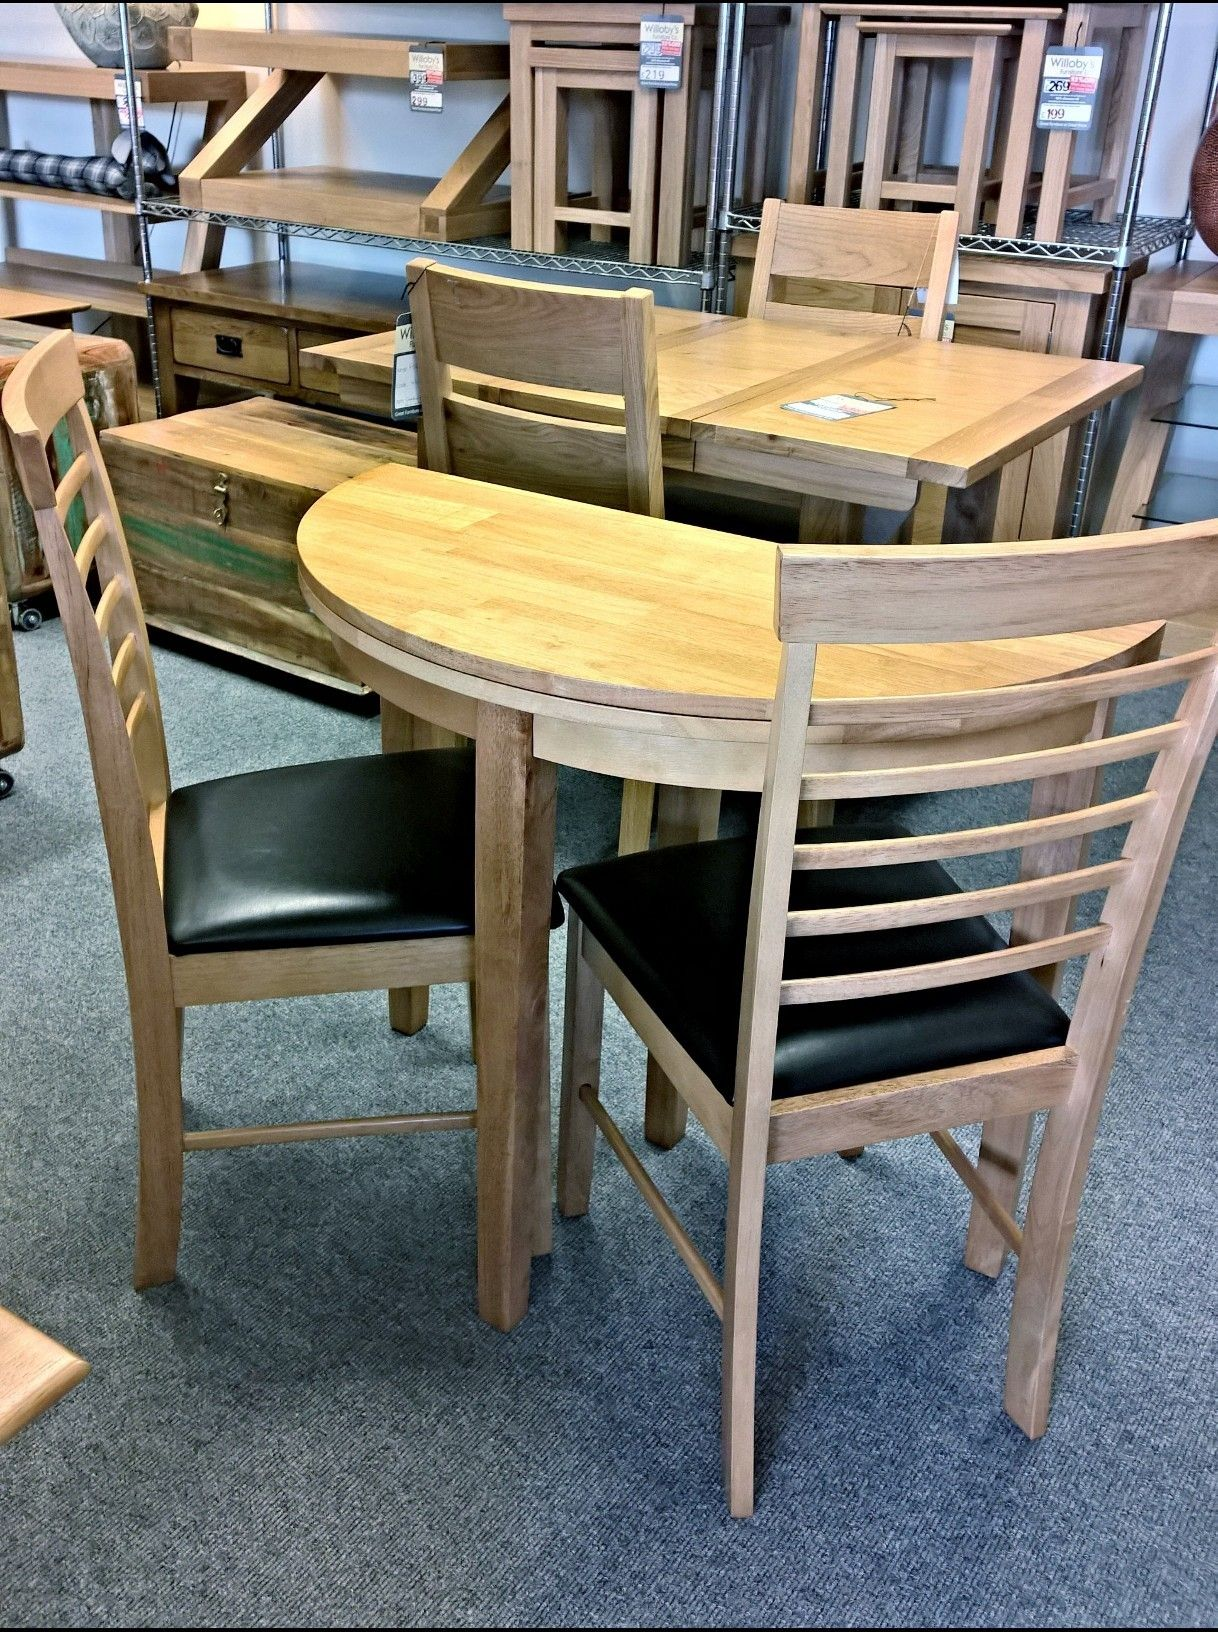 Half Moon Kitchen Table And Chairs | http://manageditservicesatlanta ...